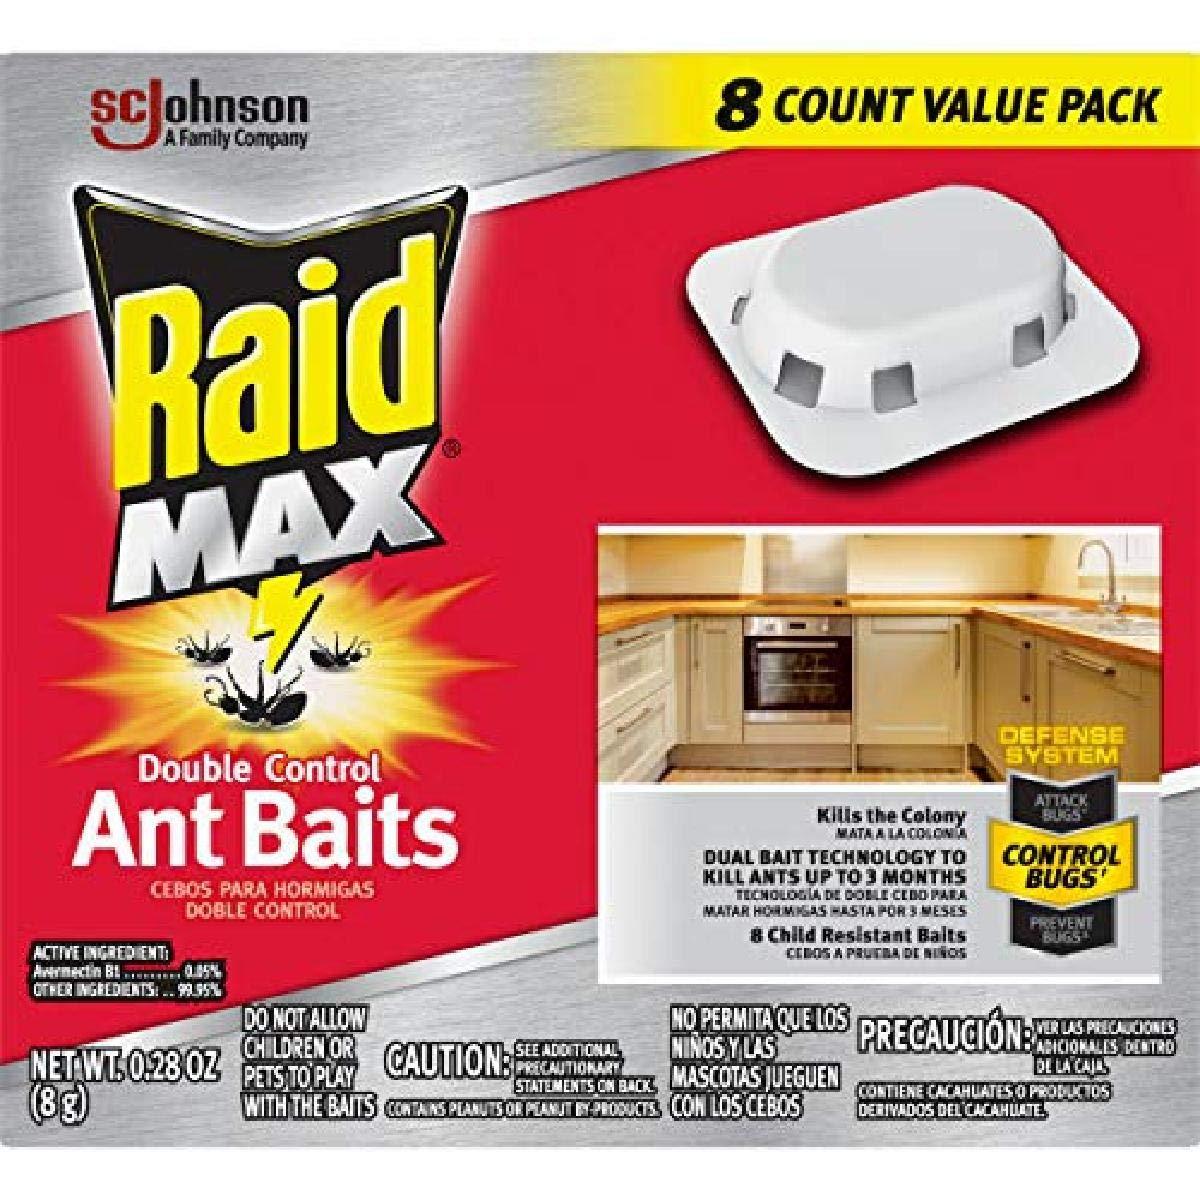 Raid Max Double Control Ant Baits 8